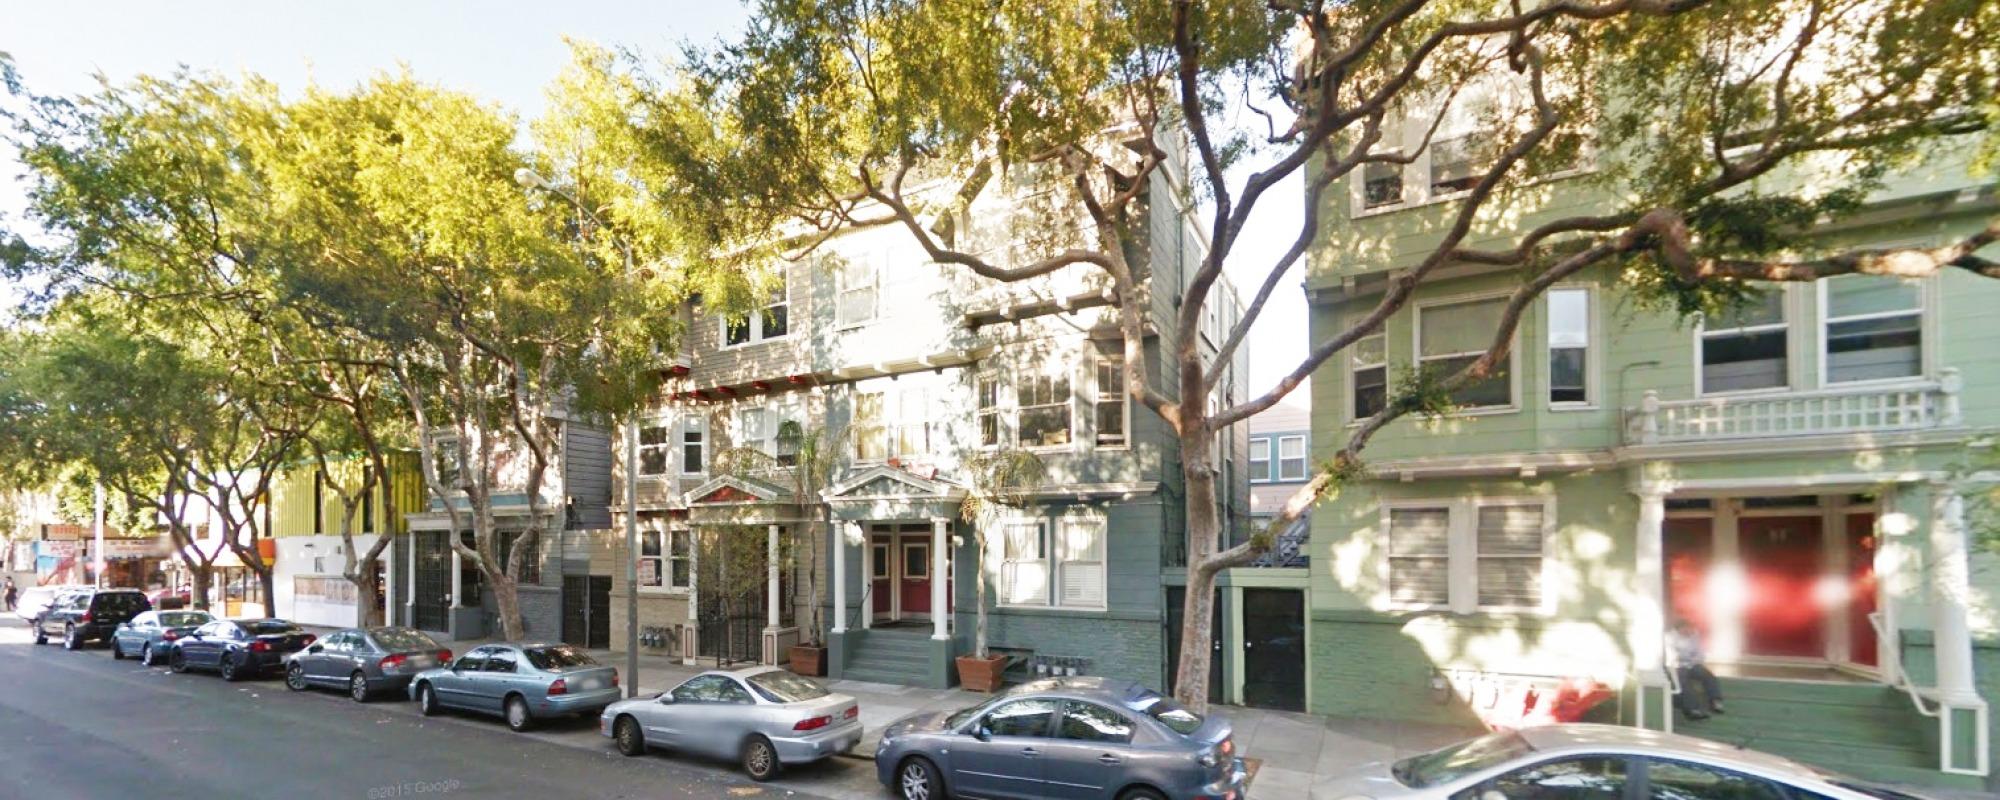 Folsom Street Streetscape Improvement Project